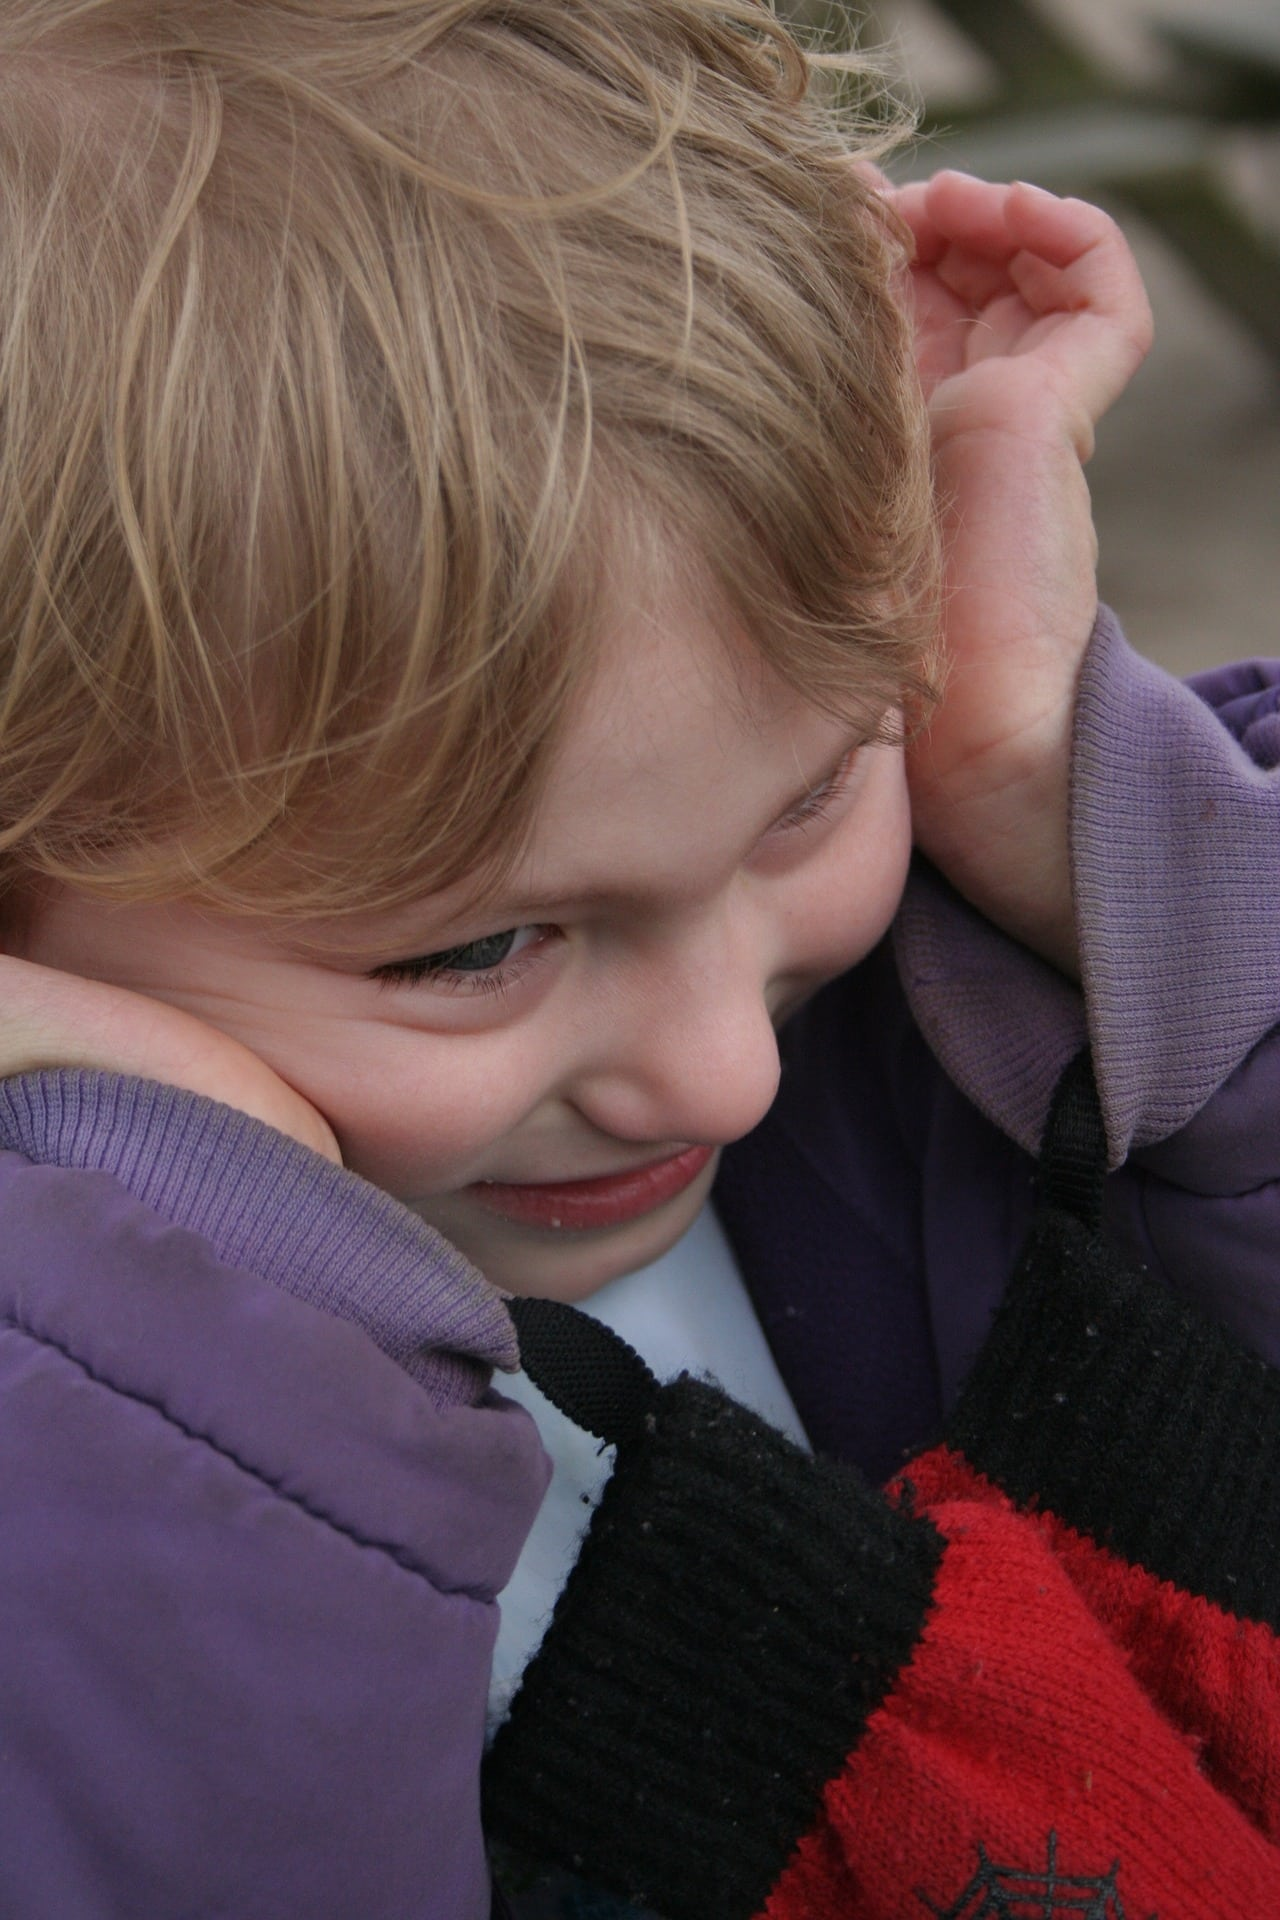 guidelines developed to determine autism in children